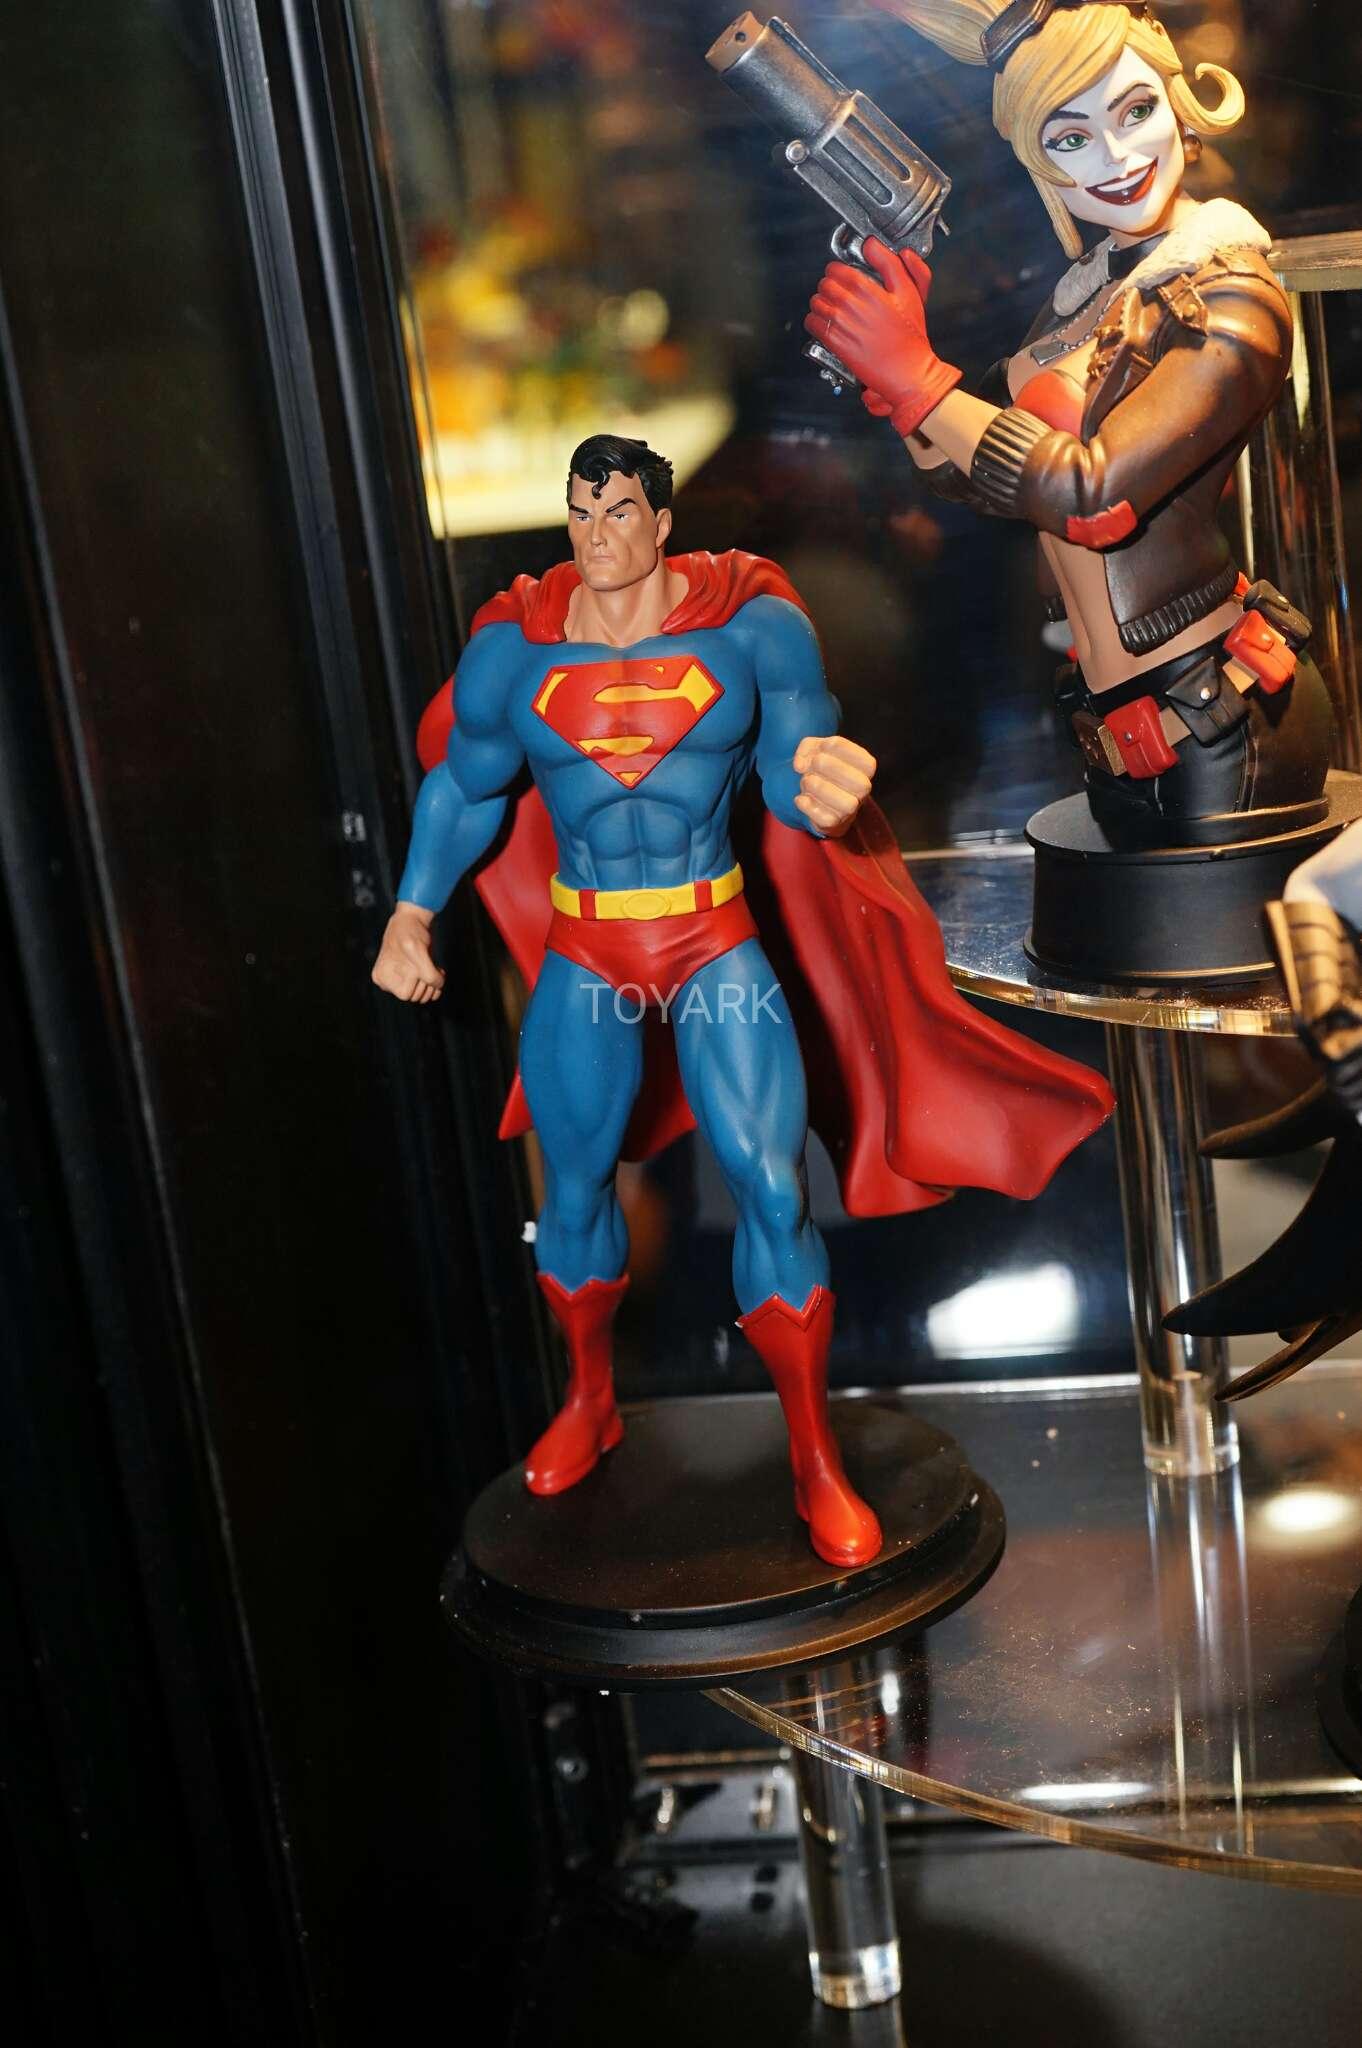 Dc Toys 2018 : Mostre e eventi toy fair icon heroes dc universe